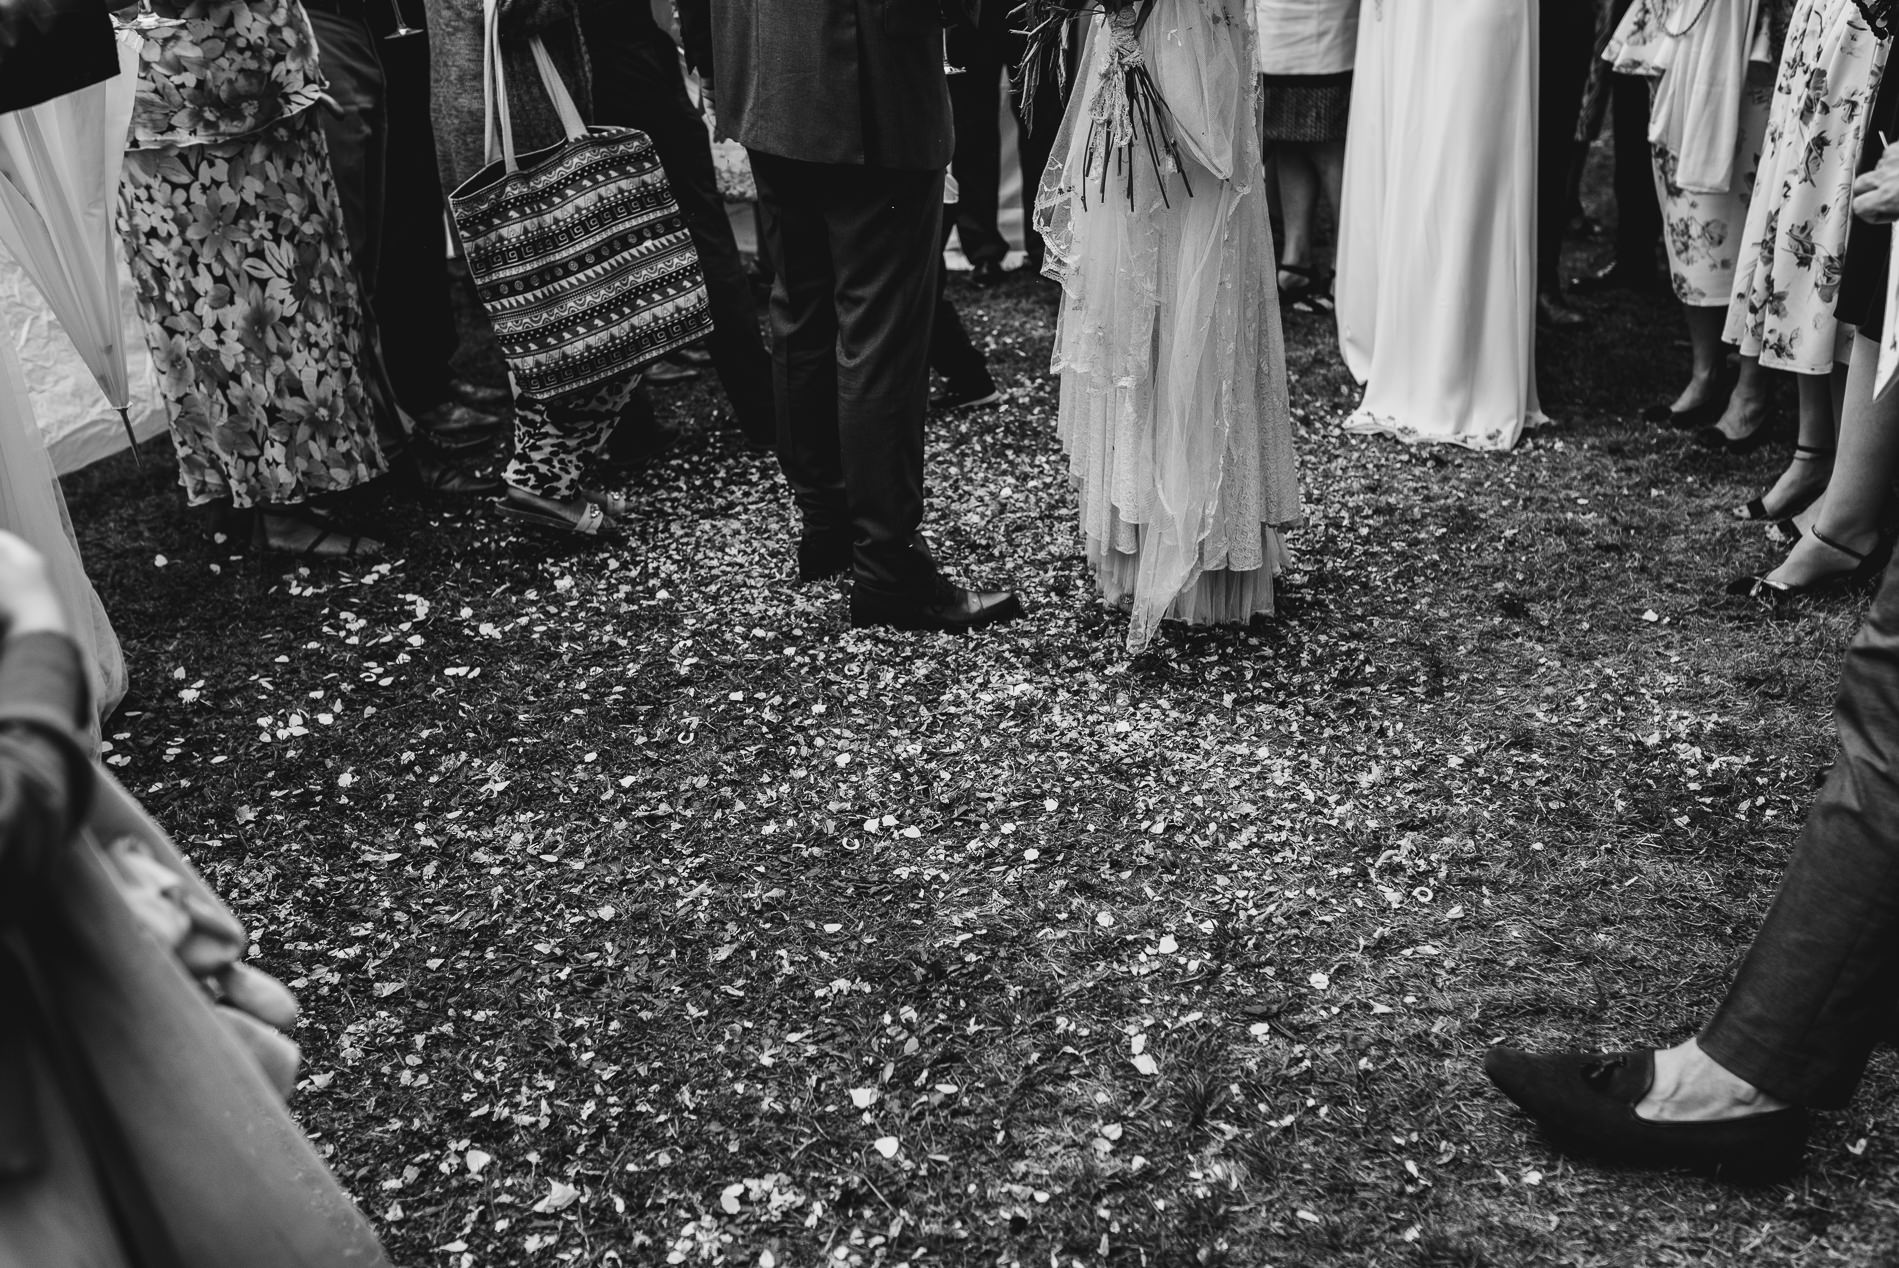 bohemian_wedding_lawshall_church_garden55